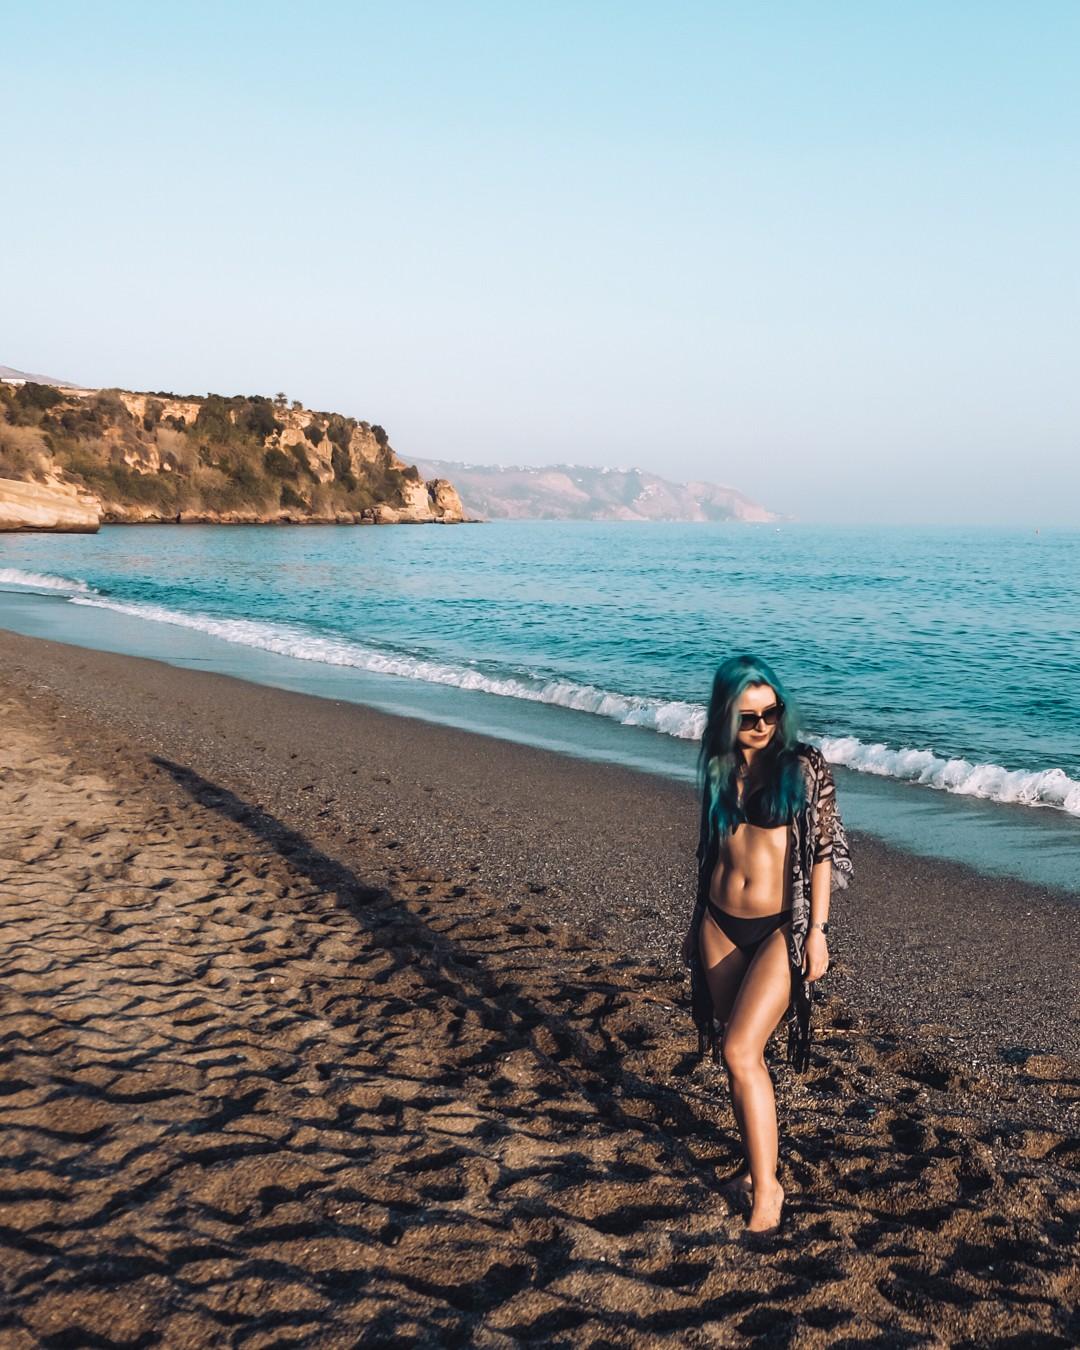 A girl with blue hair in bikini posing on the beautiful empty beach.